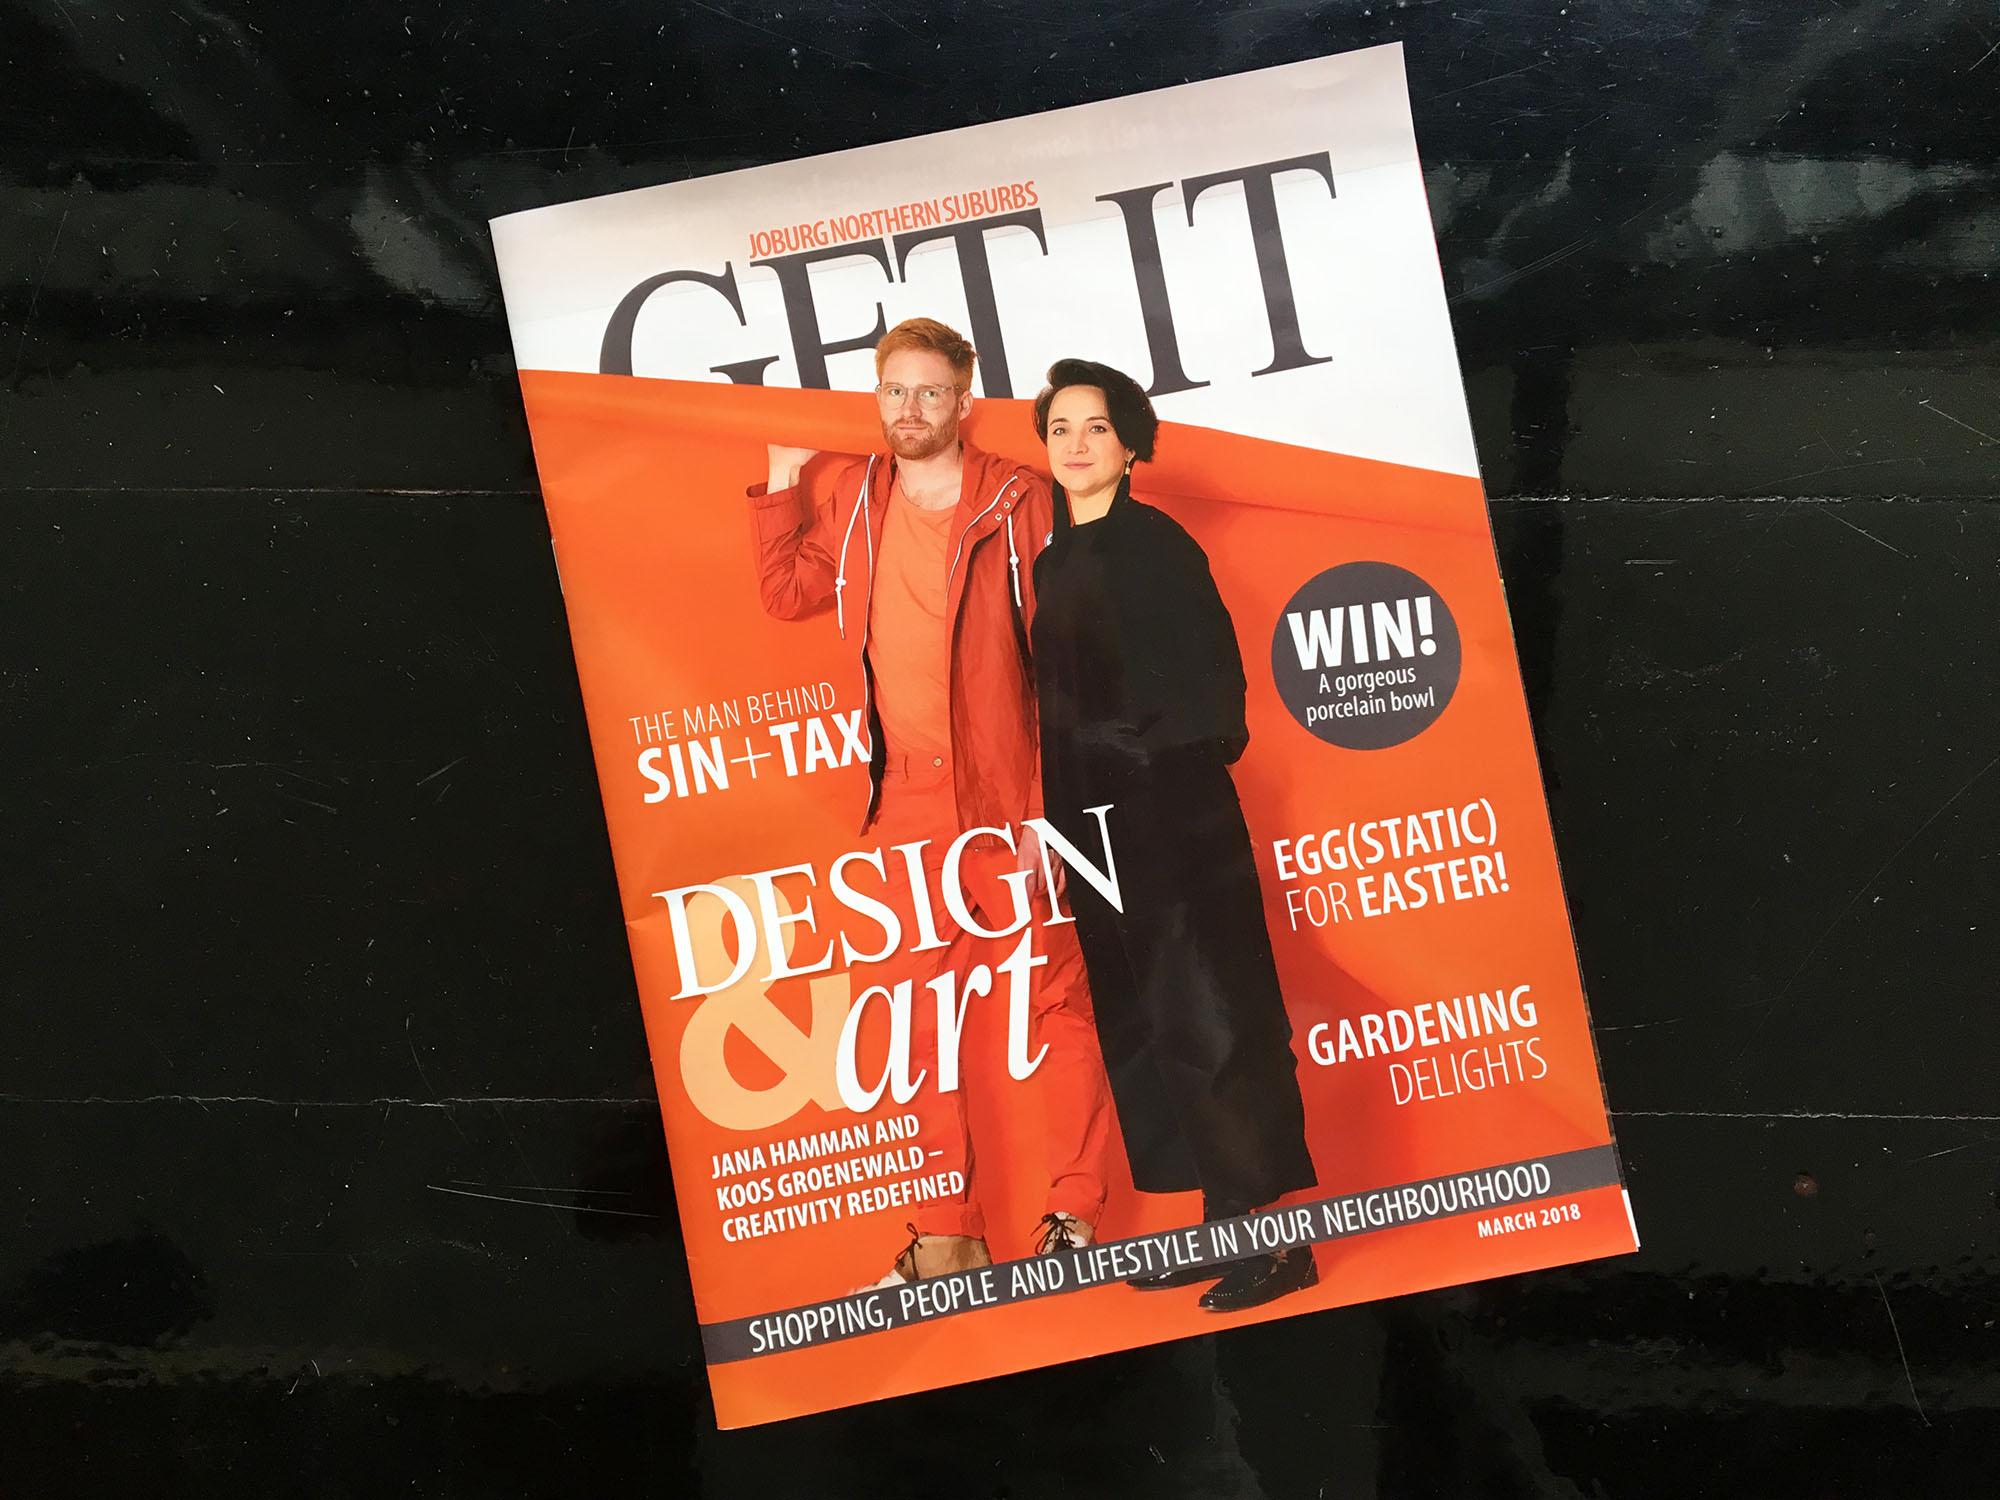 Get-It-Cover.jpg